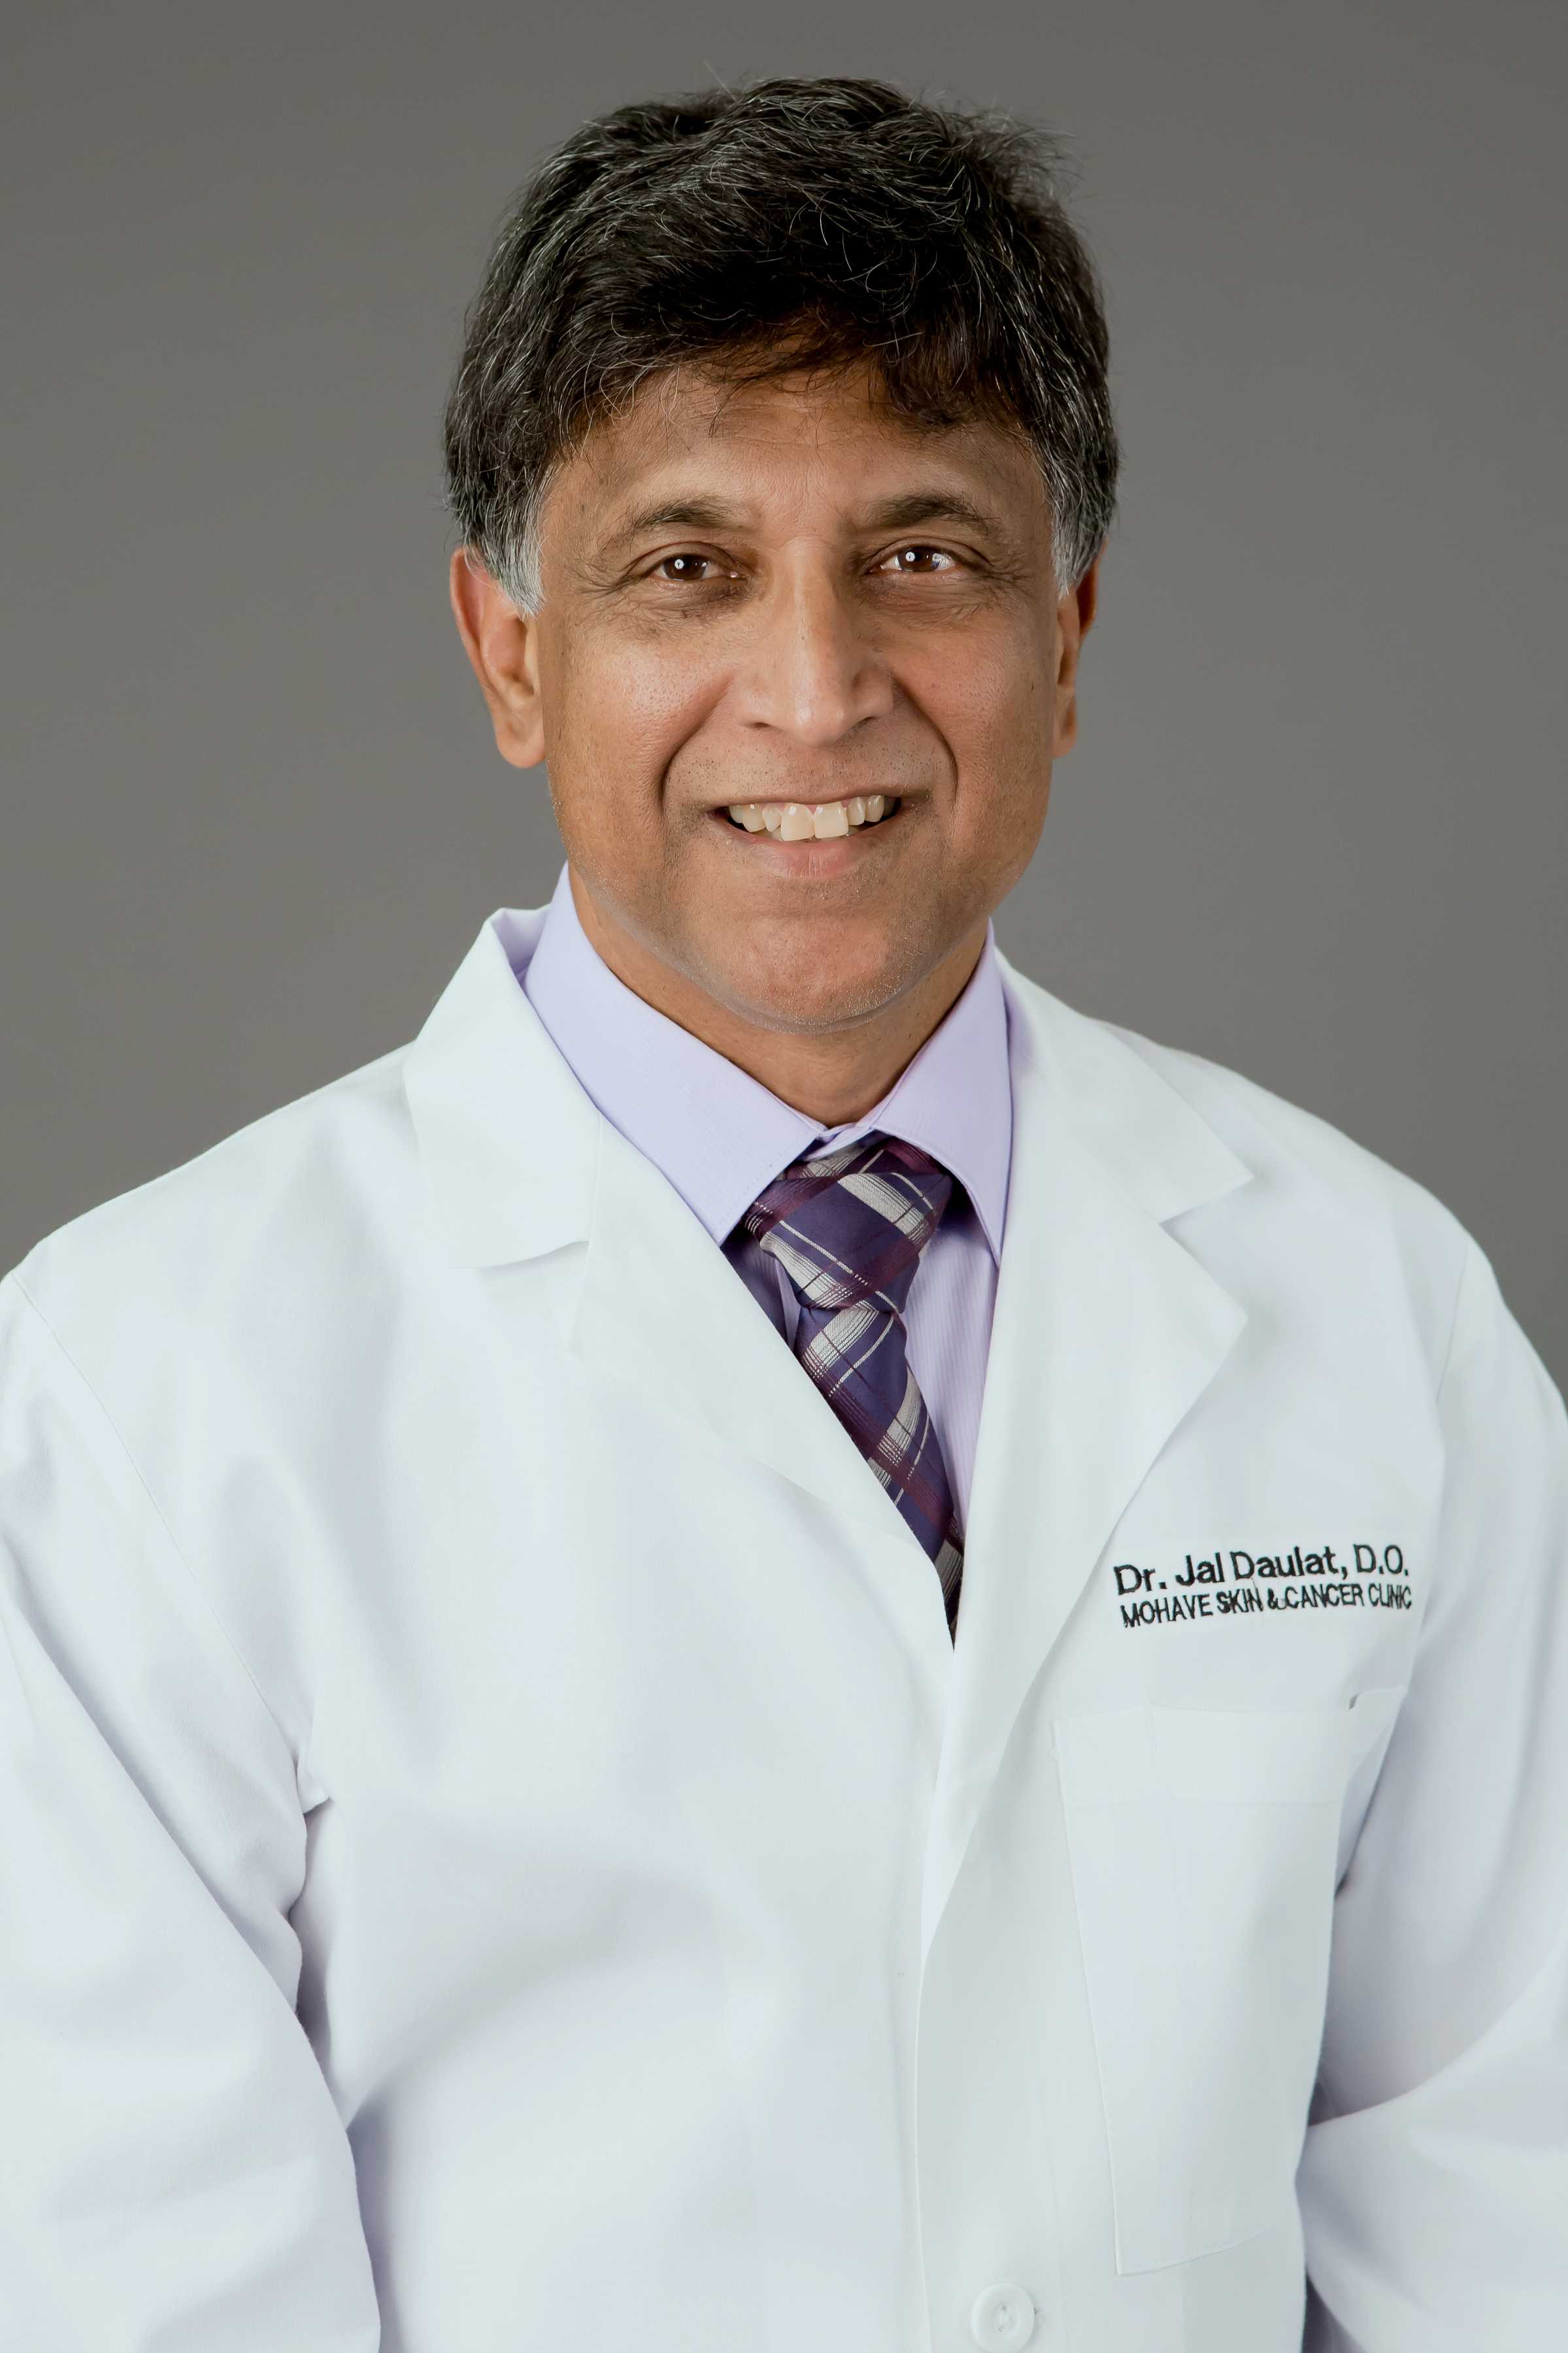 Jaldeep Daulat, D.O. Board Certified Mohs Surgeon